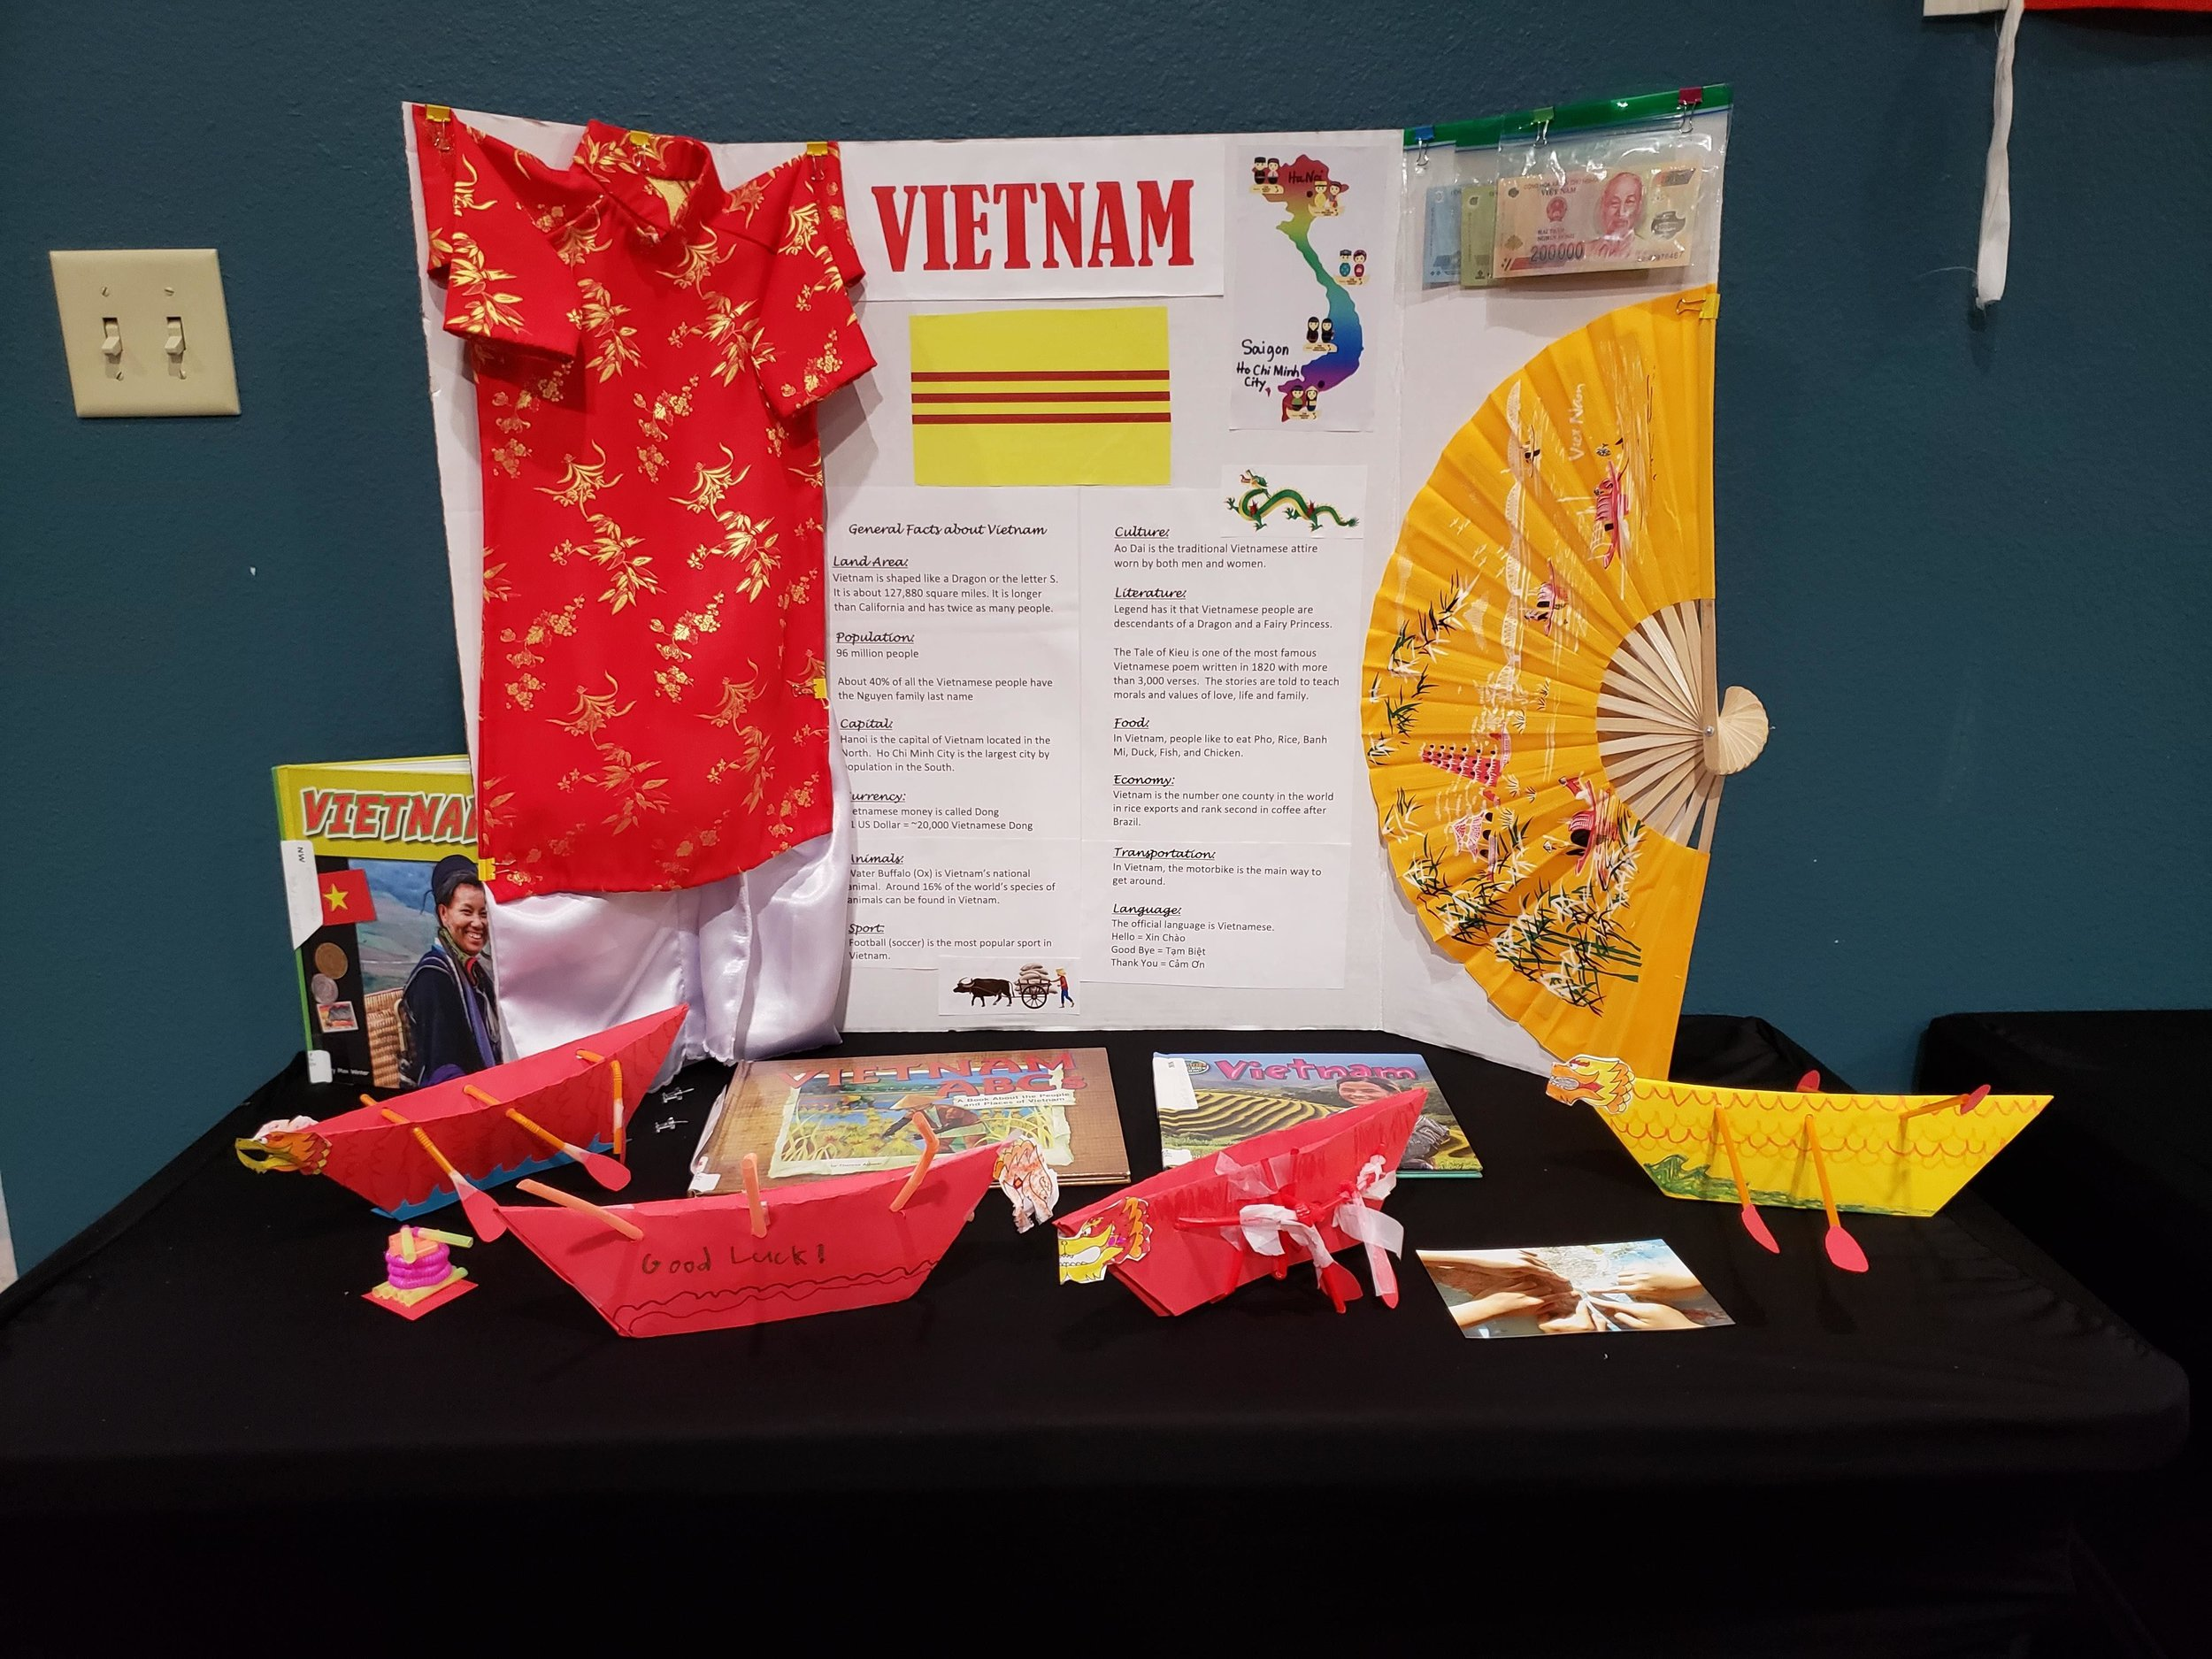 Vietnam_Poster.jpg